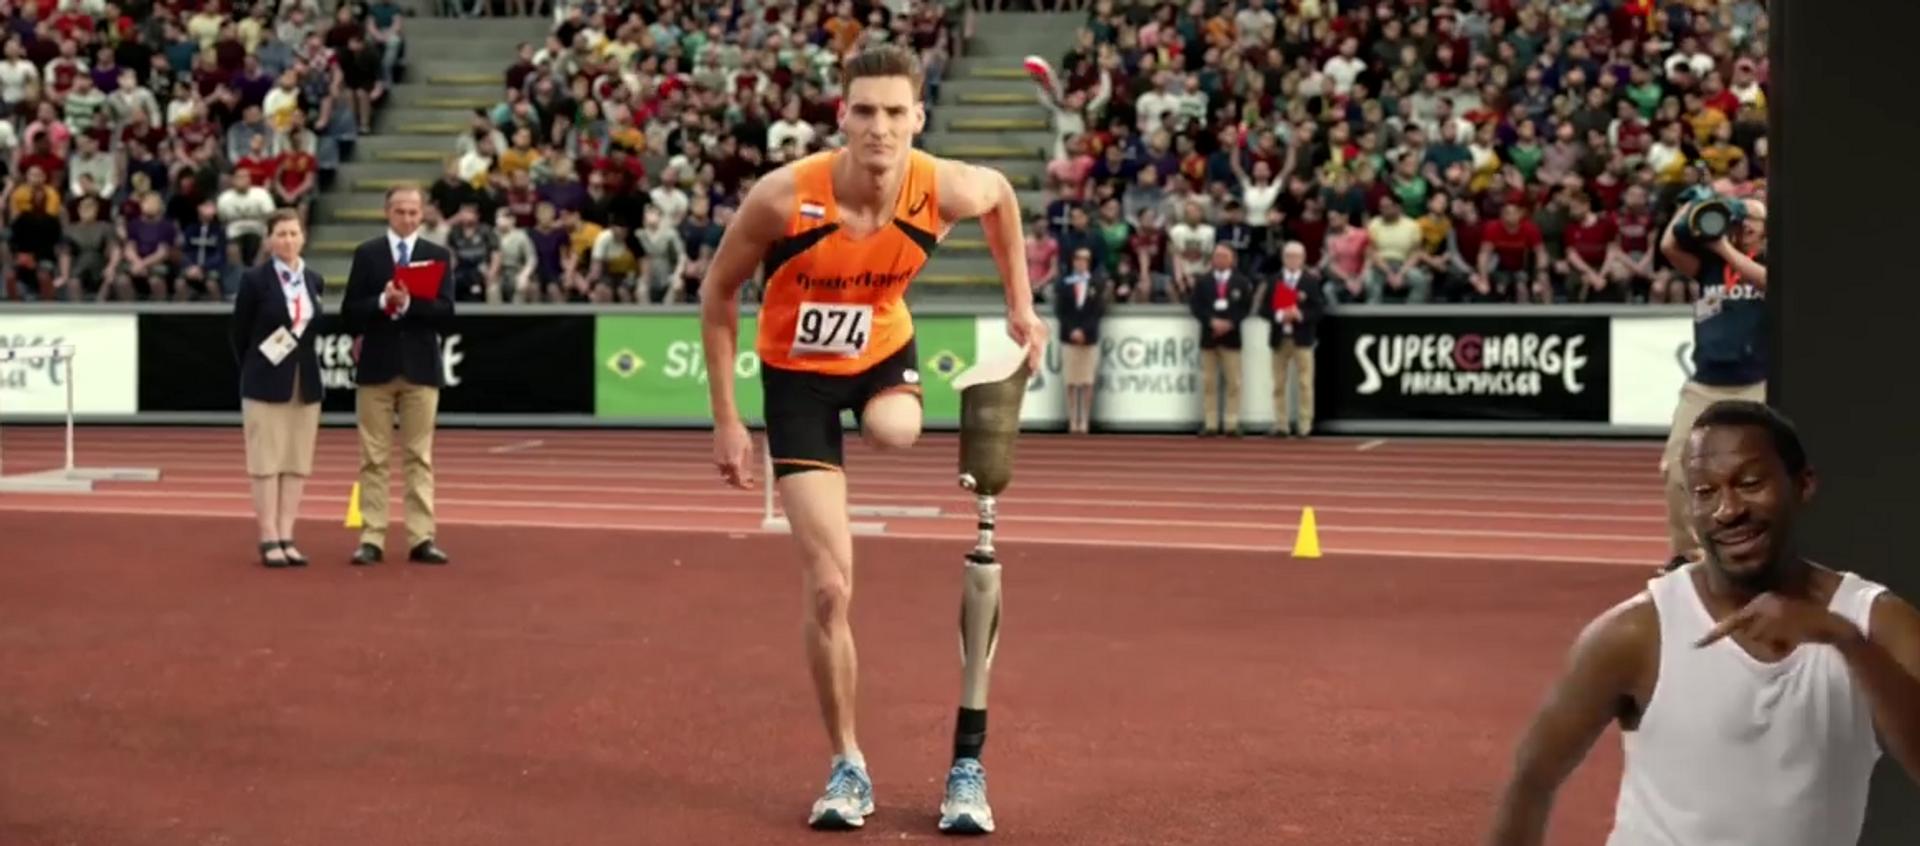 Un atleta paraolímpico - Sputnik Mundo, 1920, 16.07.2016